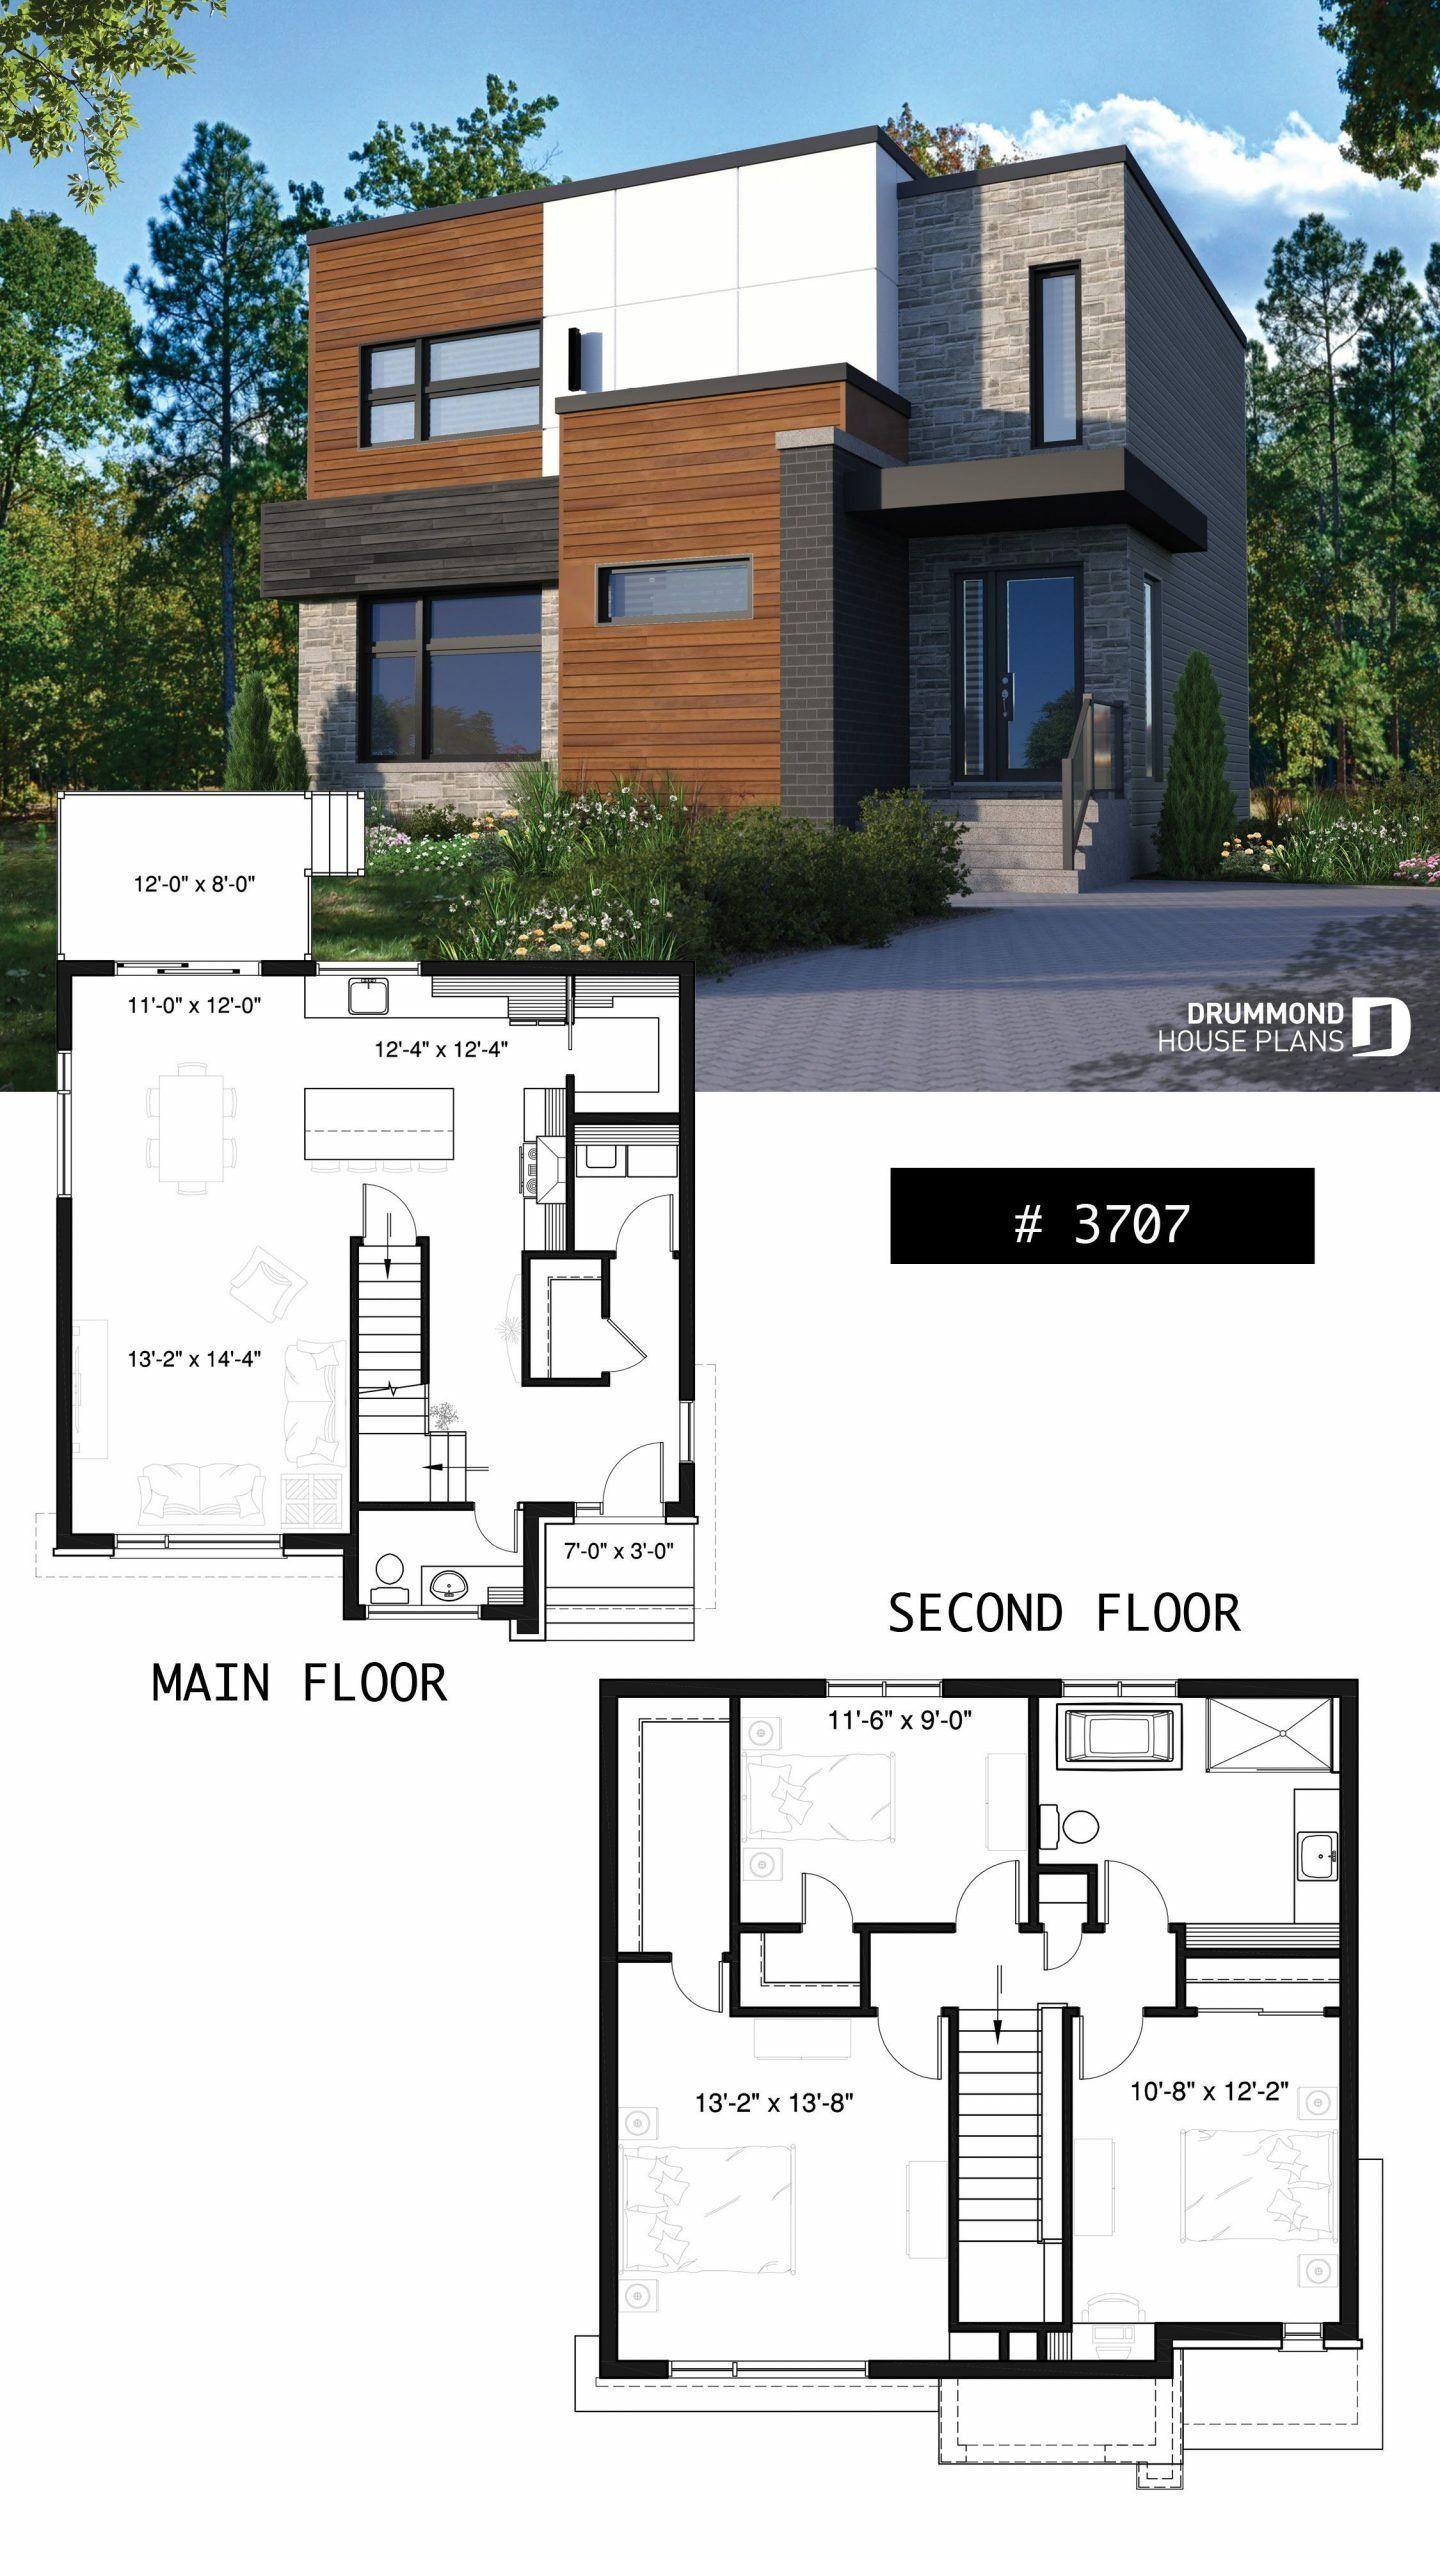 Floor Plans Modern House Designs House Plan Lavoisier No 3707 Contemporary House Plans Modern House Plans House Design Pictures